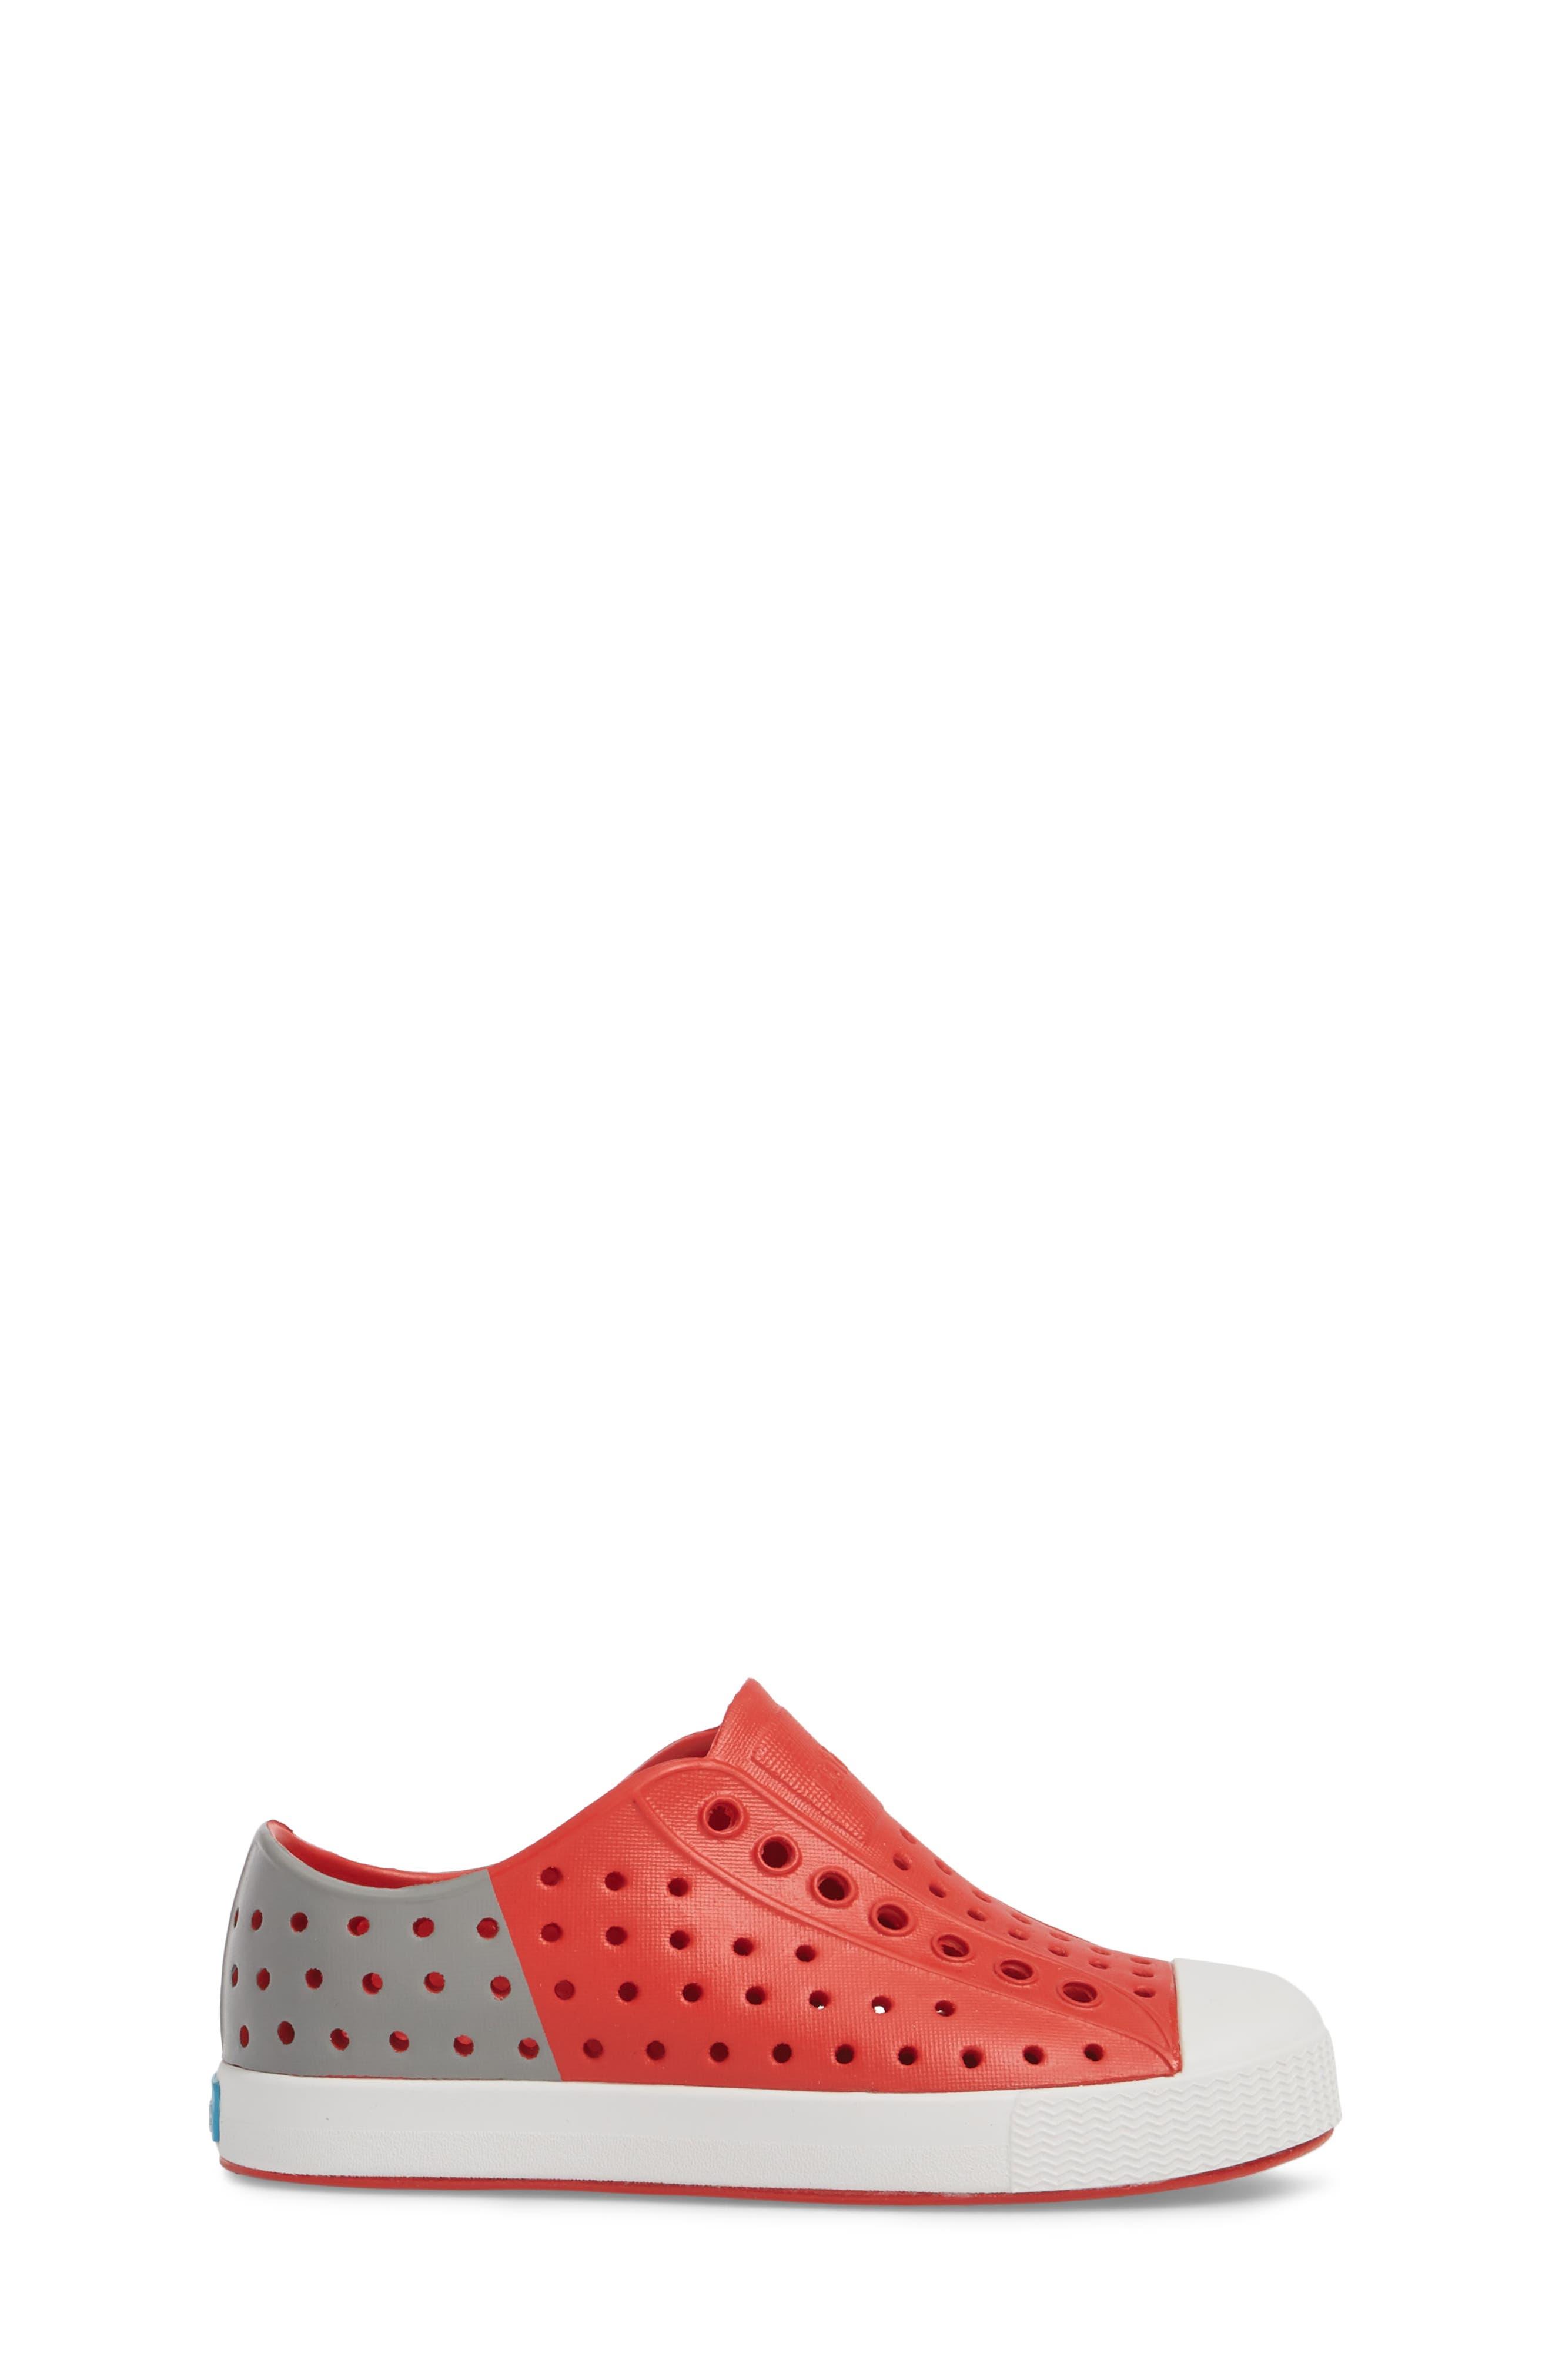 'Jefferson' Water Friendly Slip-On Sneaker,                             Alternate thumbnail 3, color,                             025